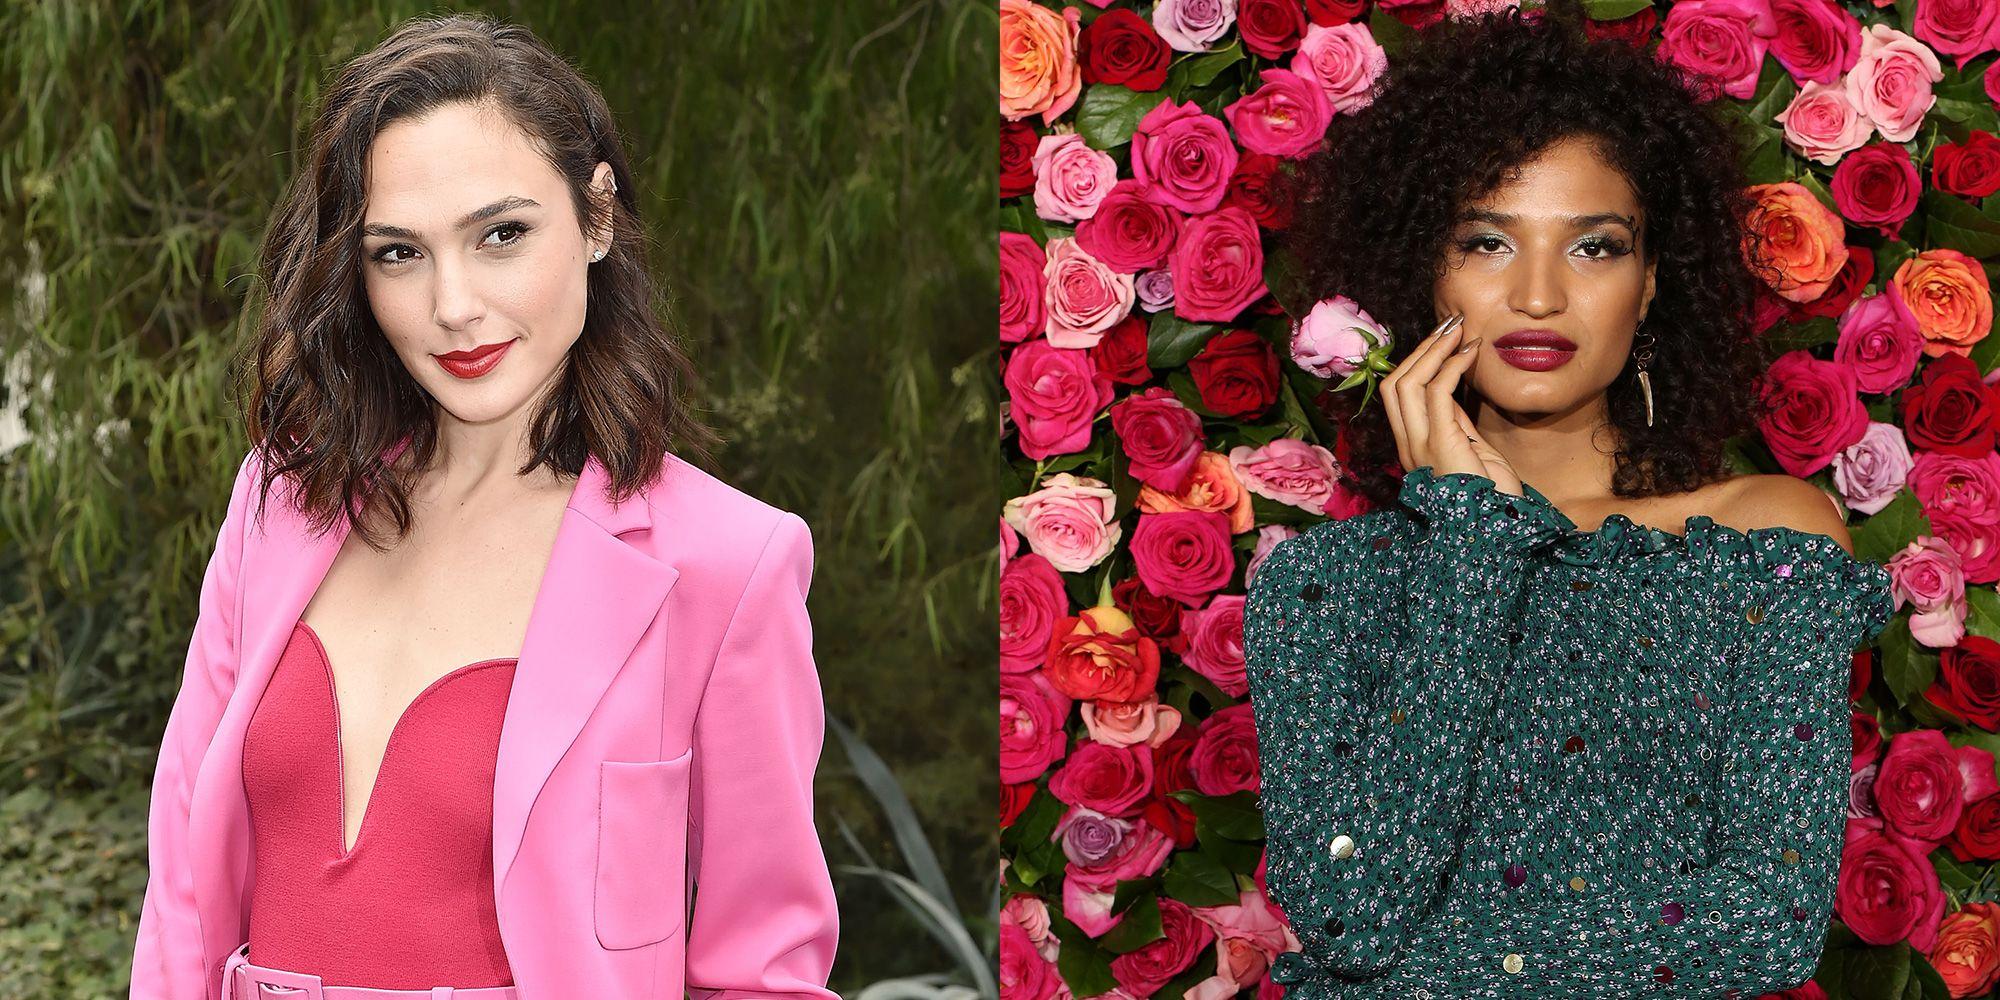 15 Celeb-Inspired Hair Color Ideas For Brunettes